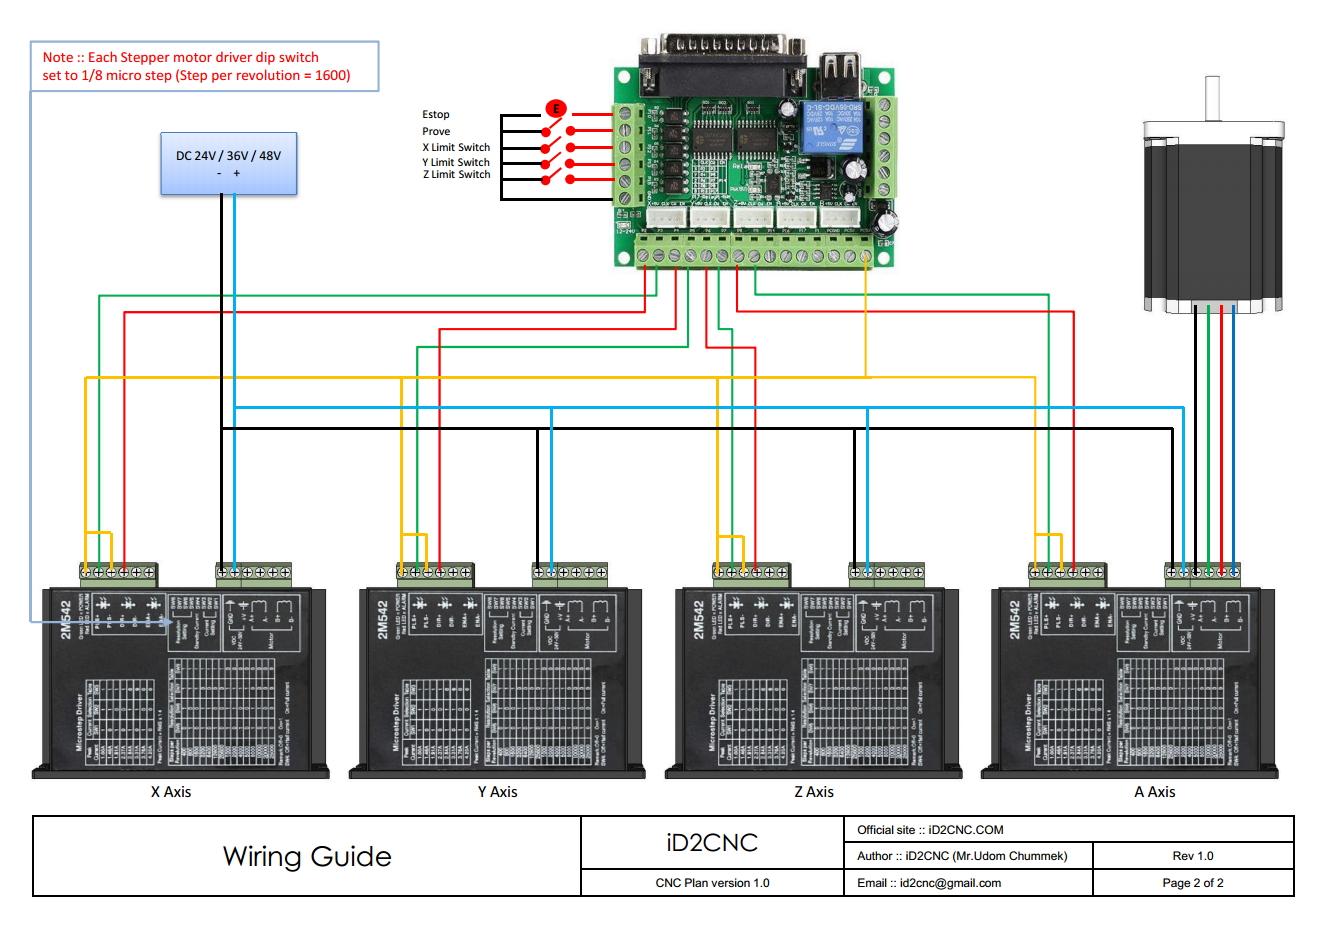 cnc wiring diagram today diagram database  cnc breakout board wiring diagram #10